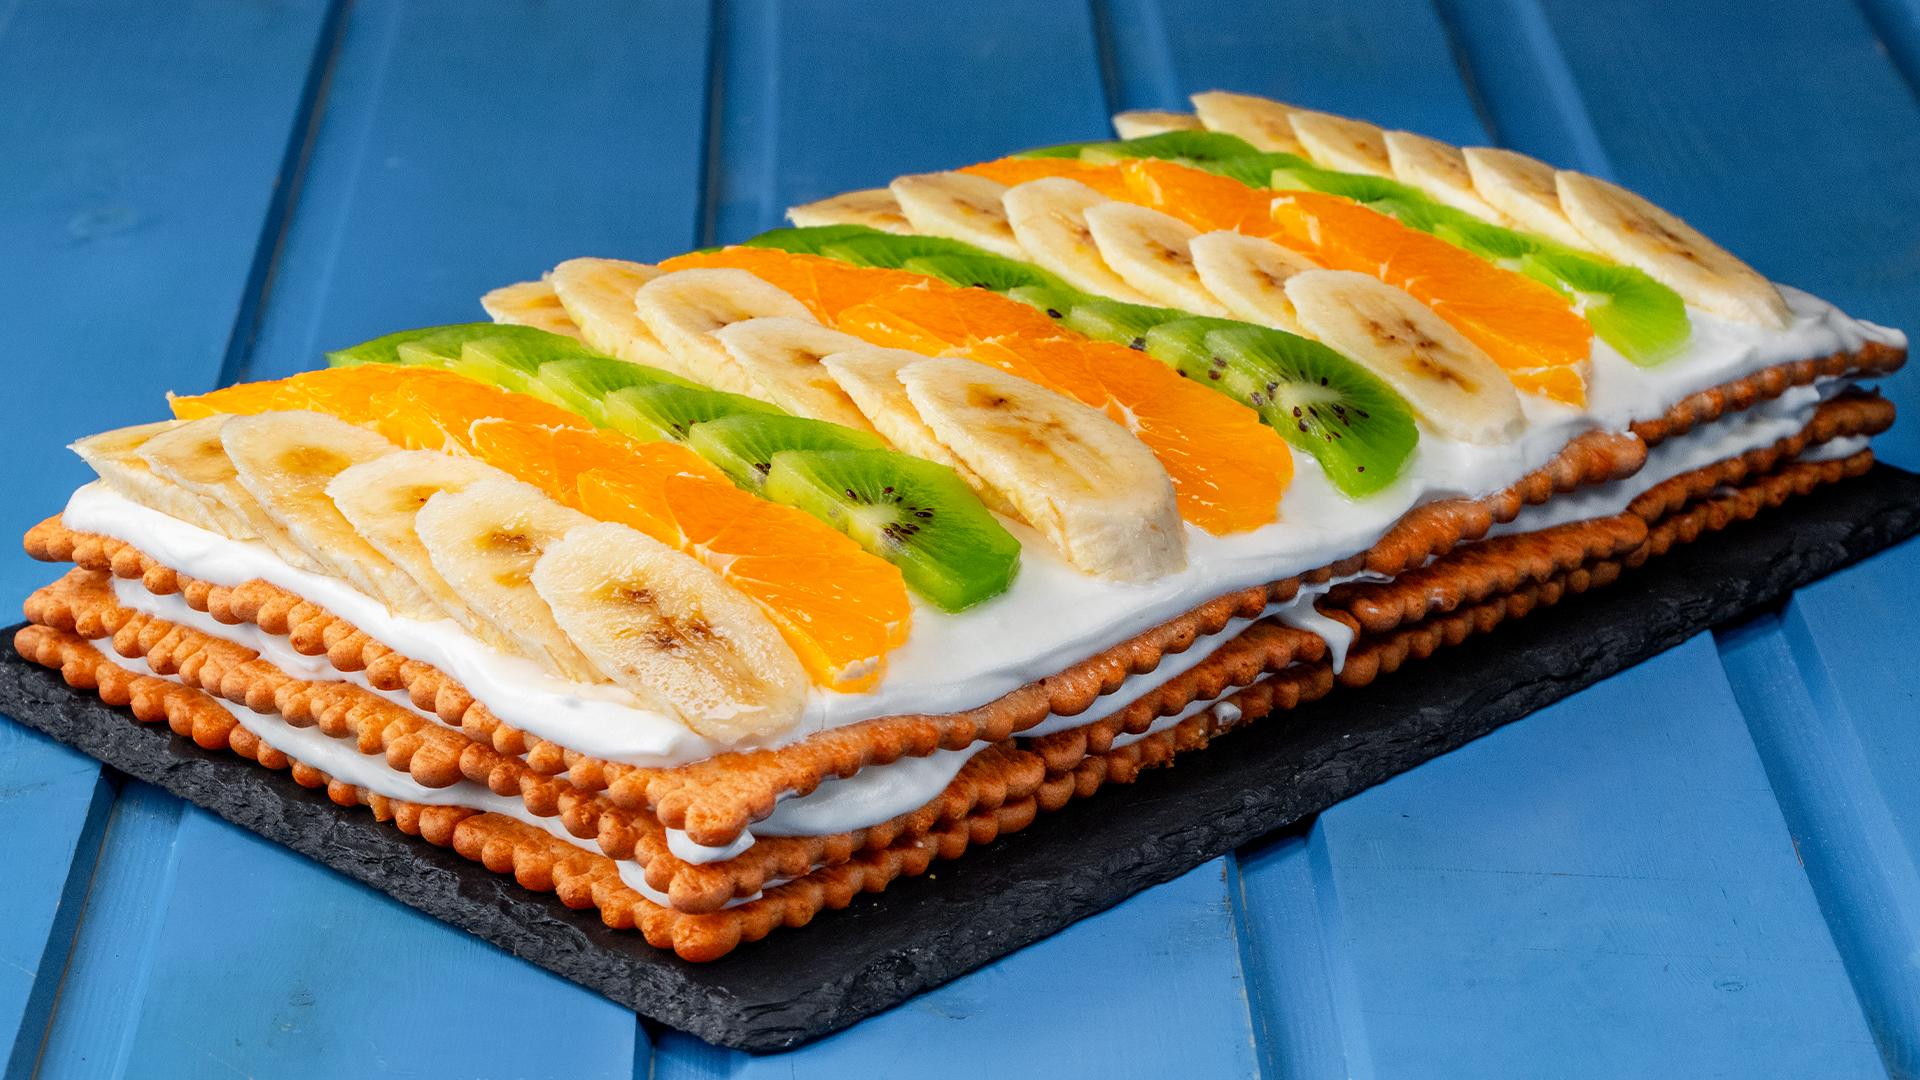 Fara cuptor si ore in bucatarie! Surprinde cu un tort racoritor in culori perfect imbinate!